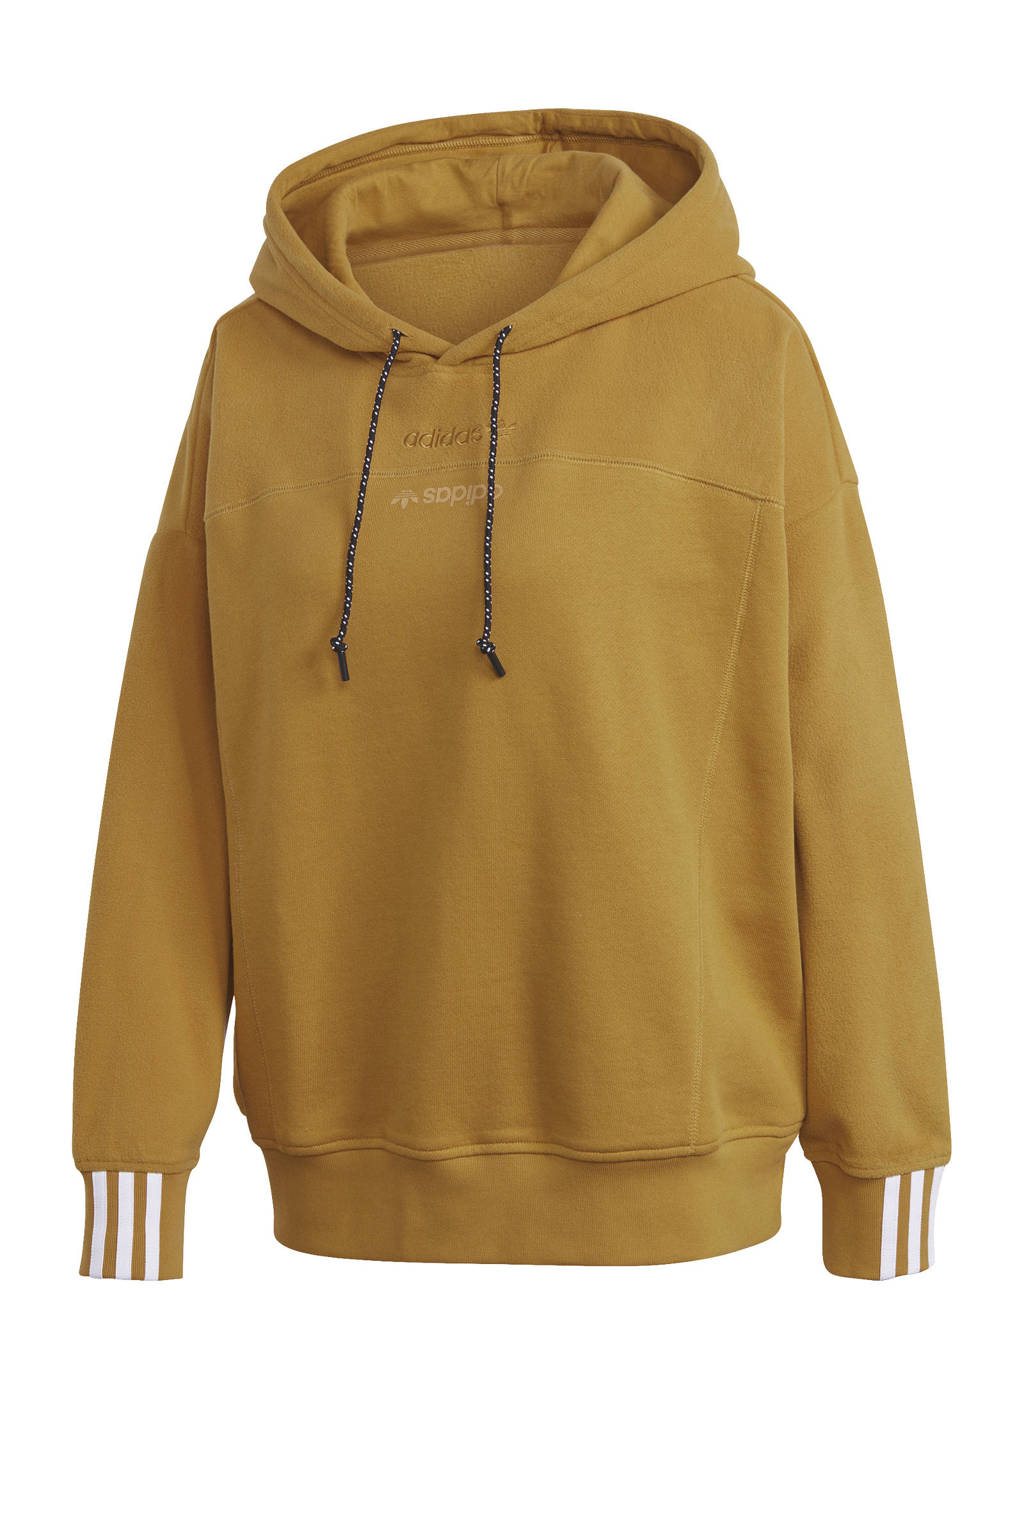 adidas Originals hoodie bruin, Bruin